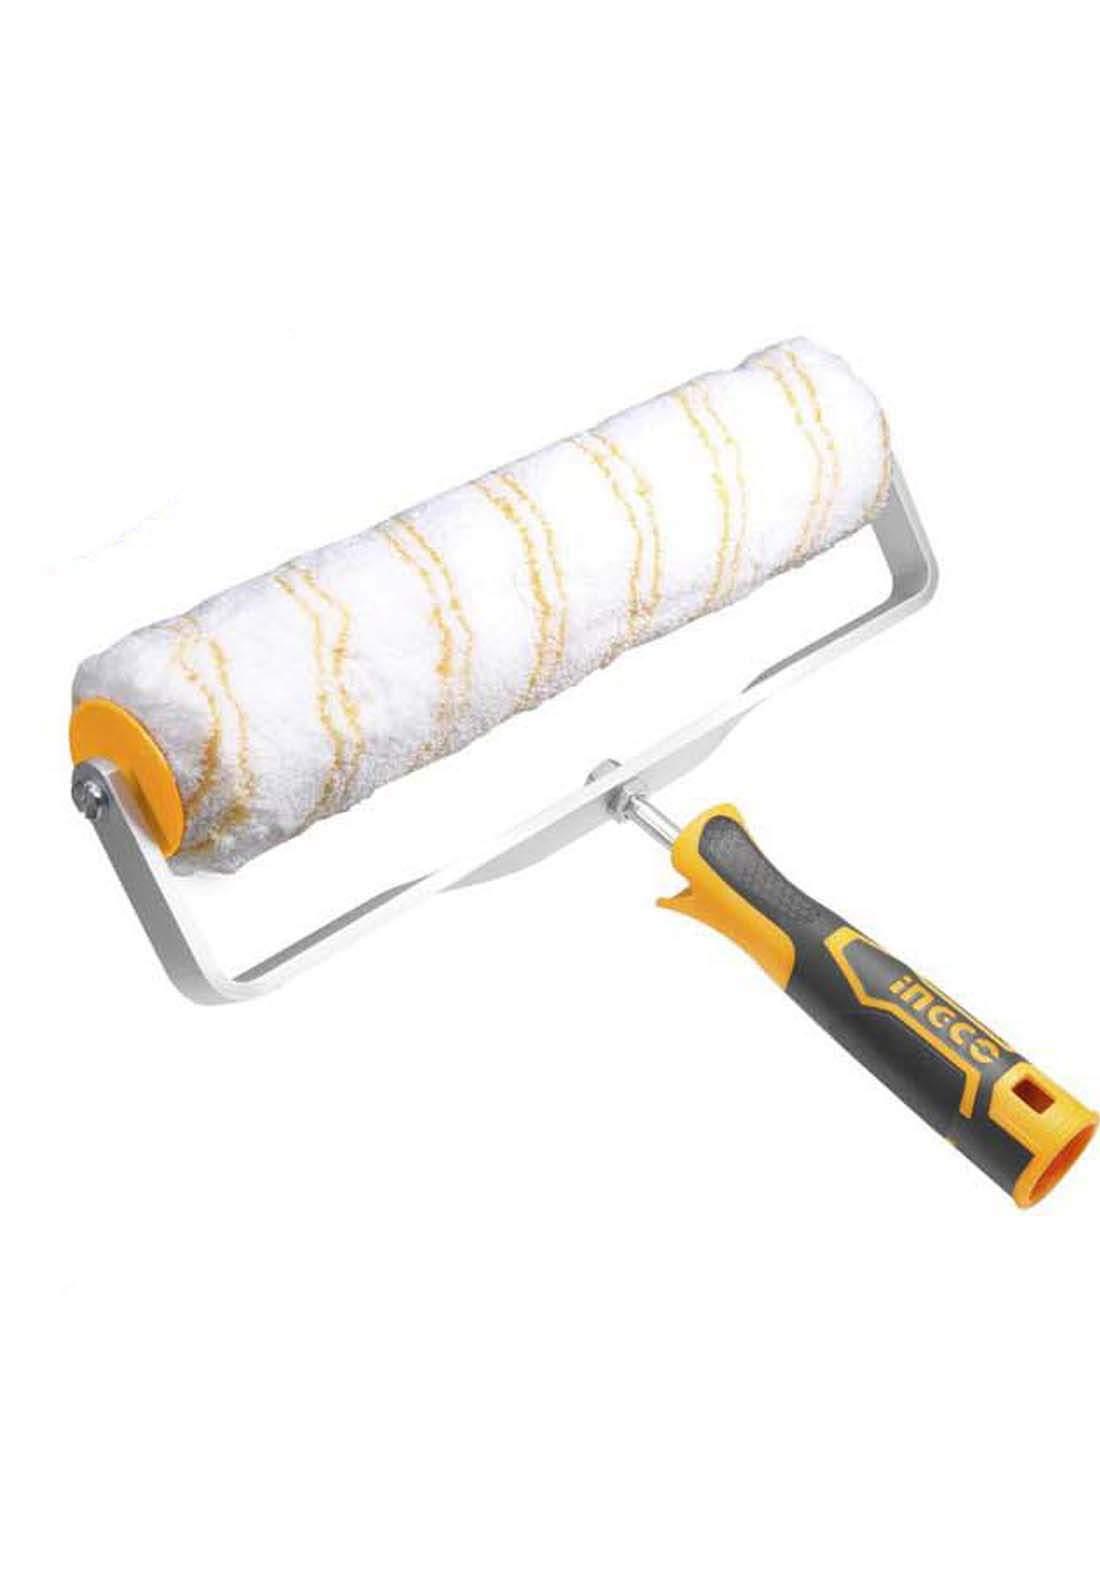 Ingco - hrht093051  Paint roller  رول دهان 305 ملم